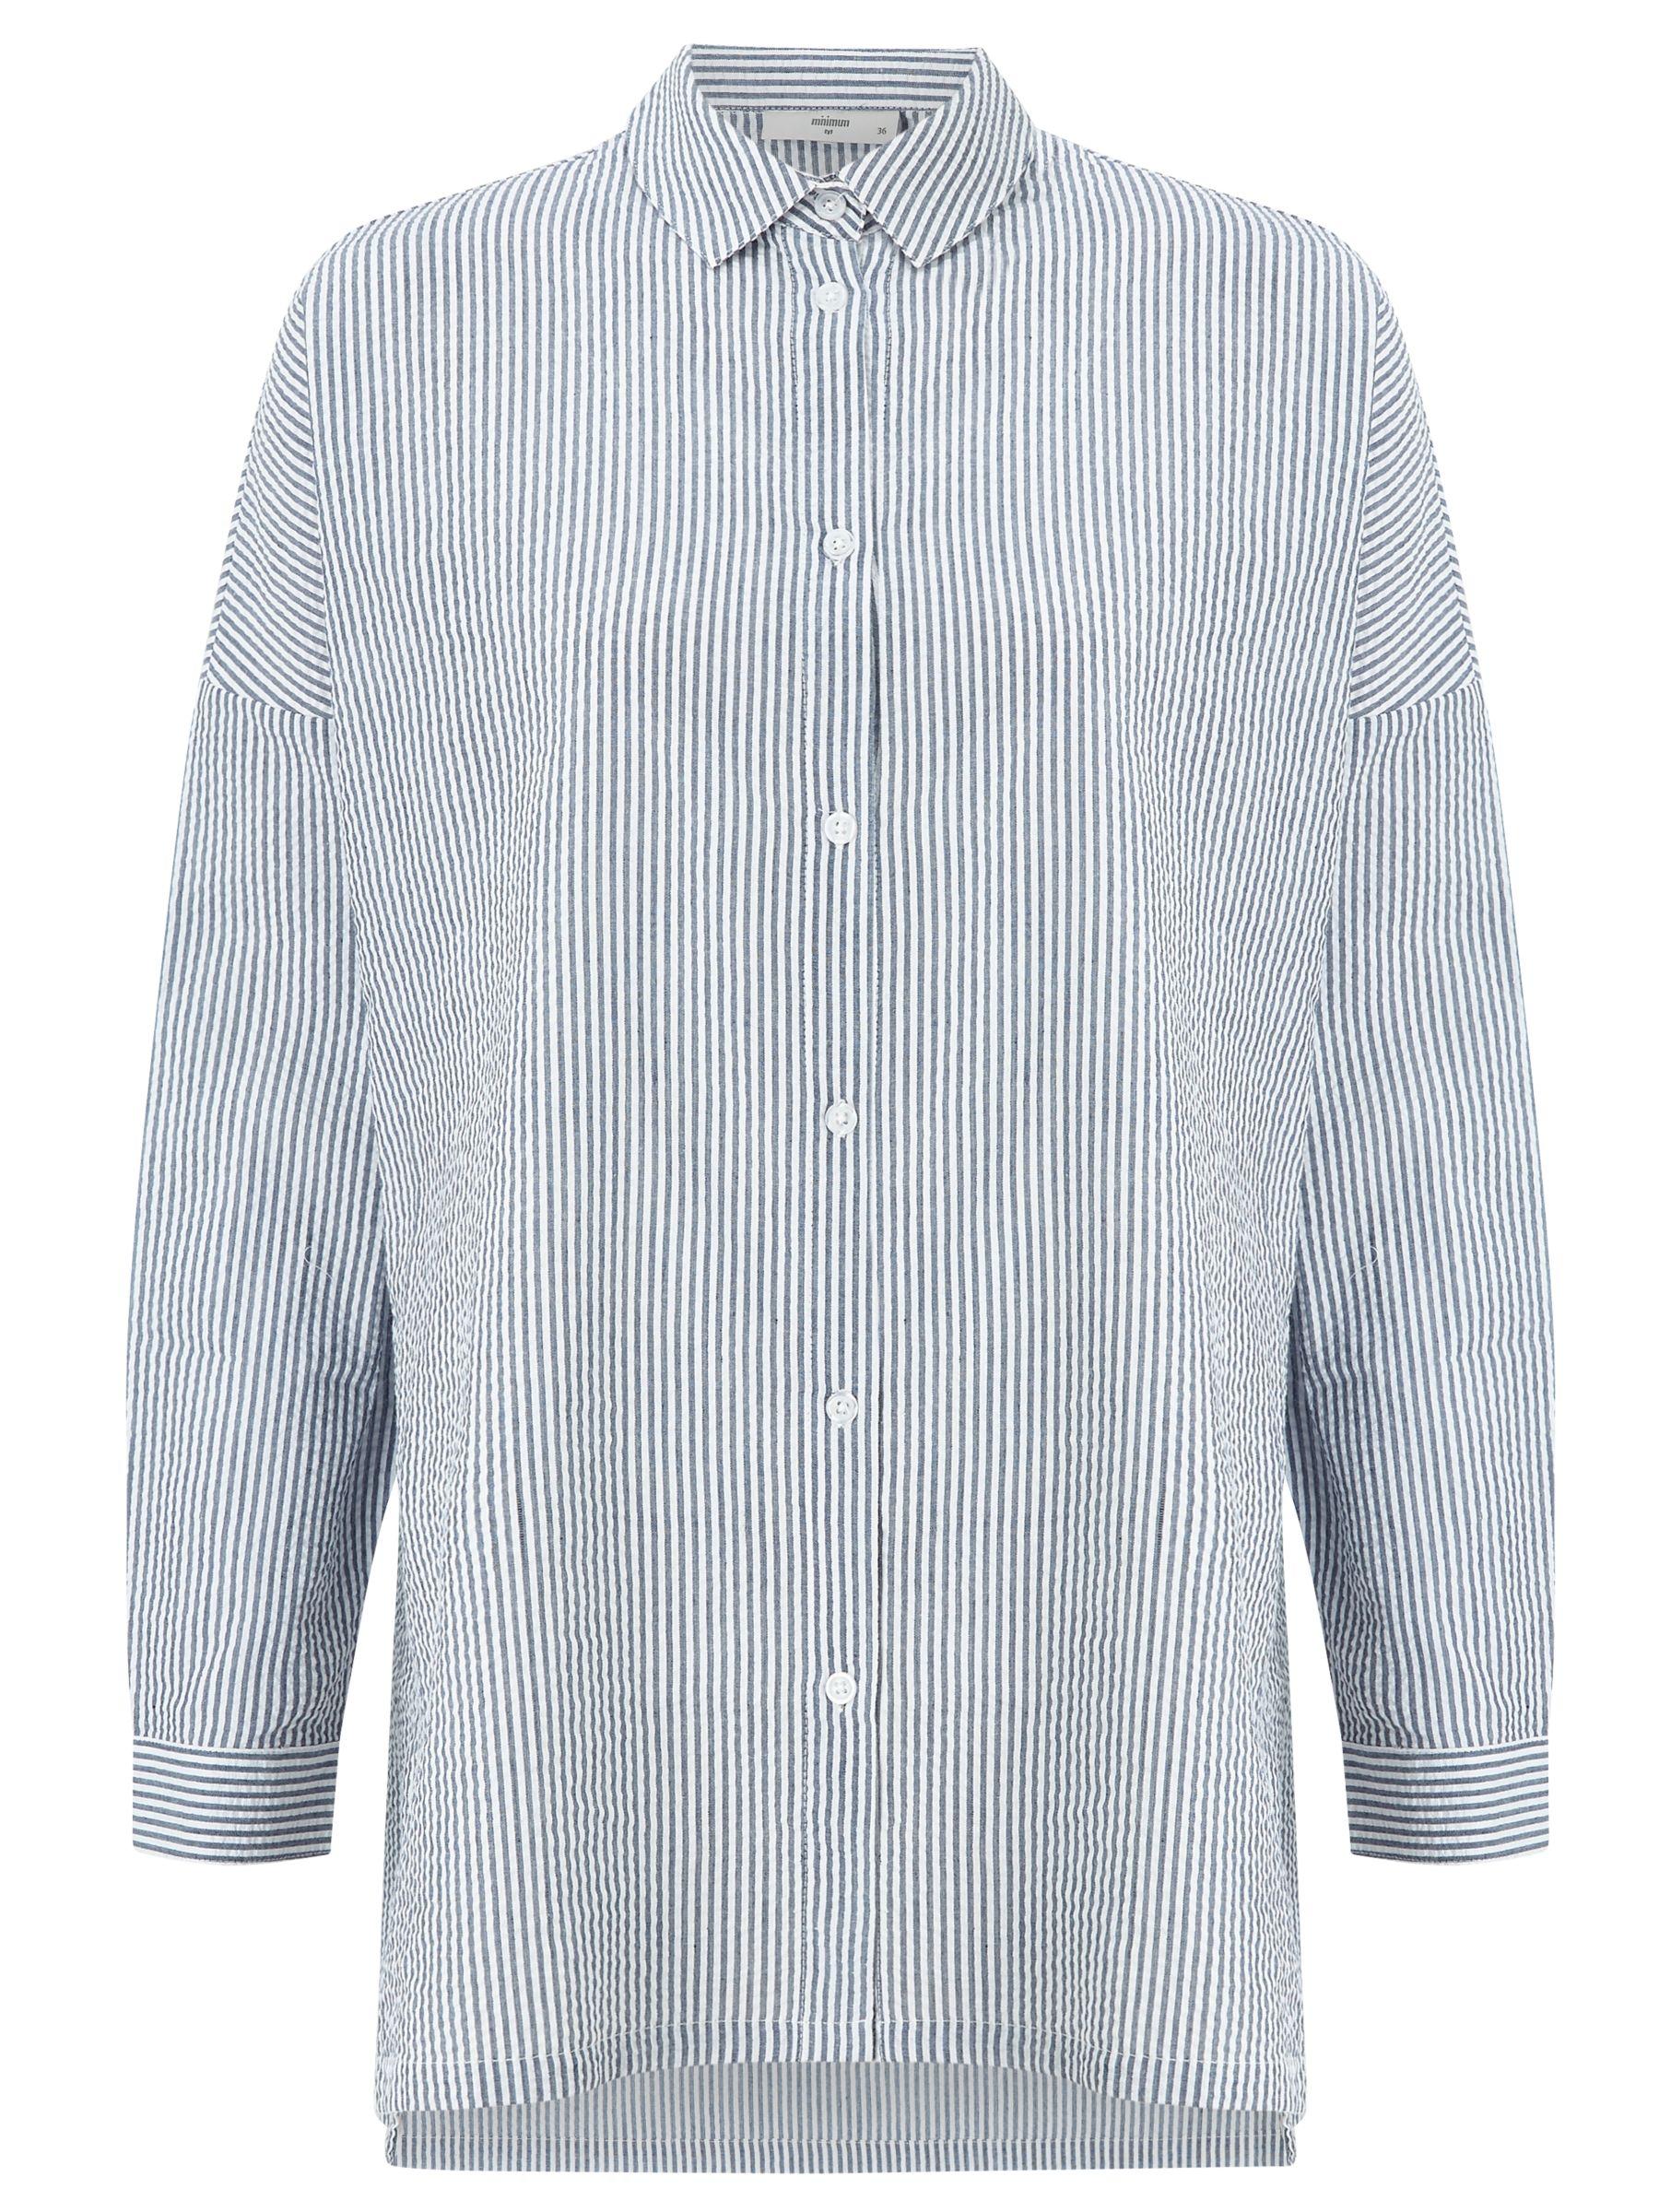 Minimum Minimum Mounia Thin Stripe Shirt, Faded Denim